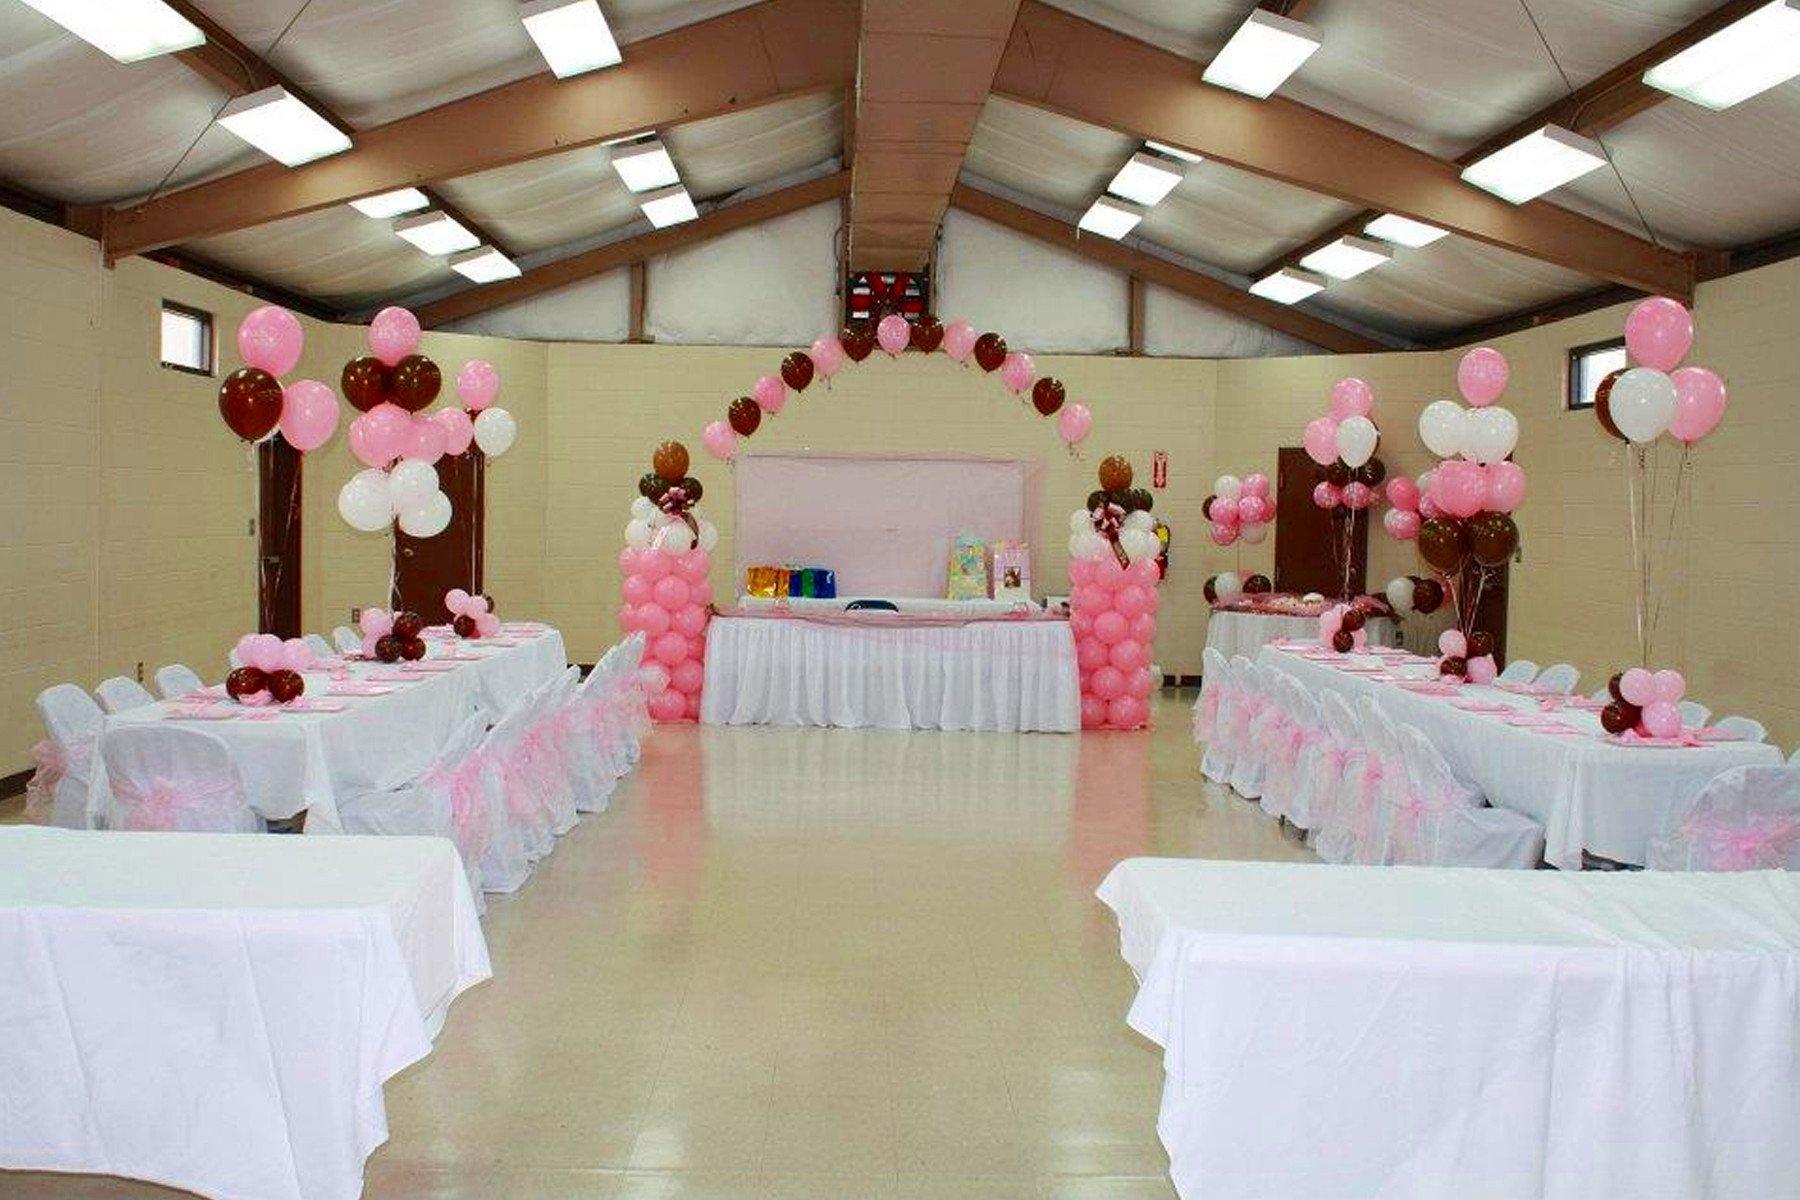 10 Fabulous Baby Shower Table Decoration Ideas decorations for baby shower beautiful decoration ideas jpg loversiq 2020